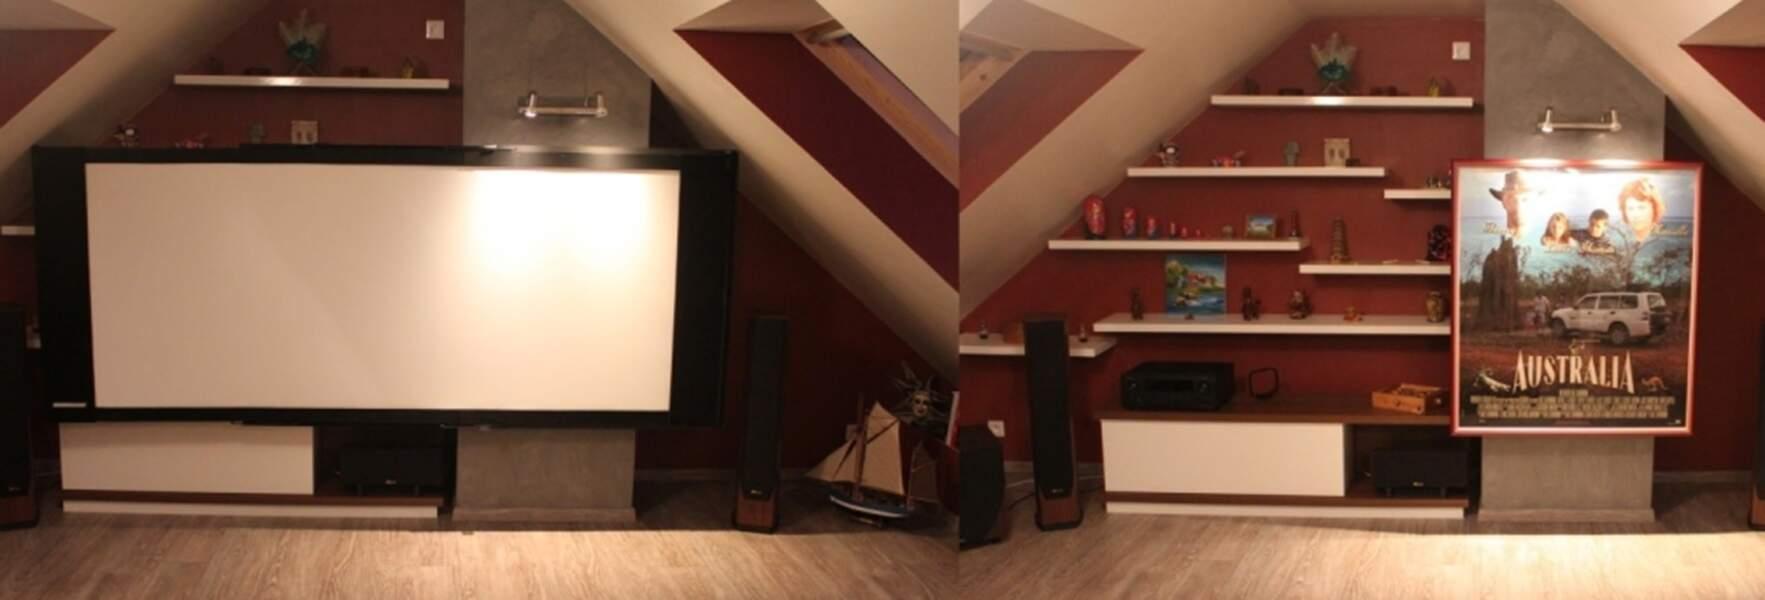 Design Screen : l'écran de projection haut de gamme